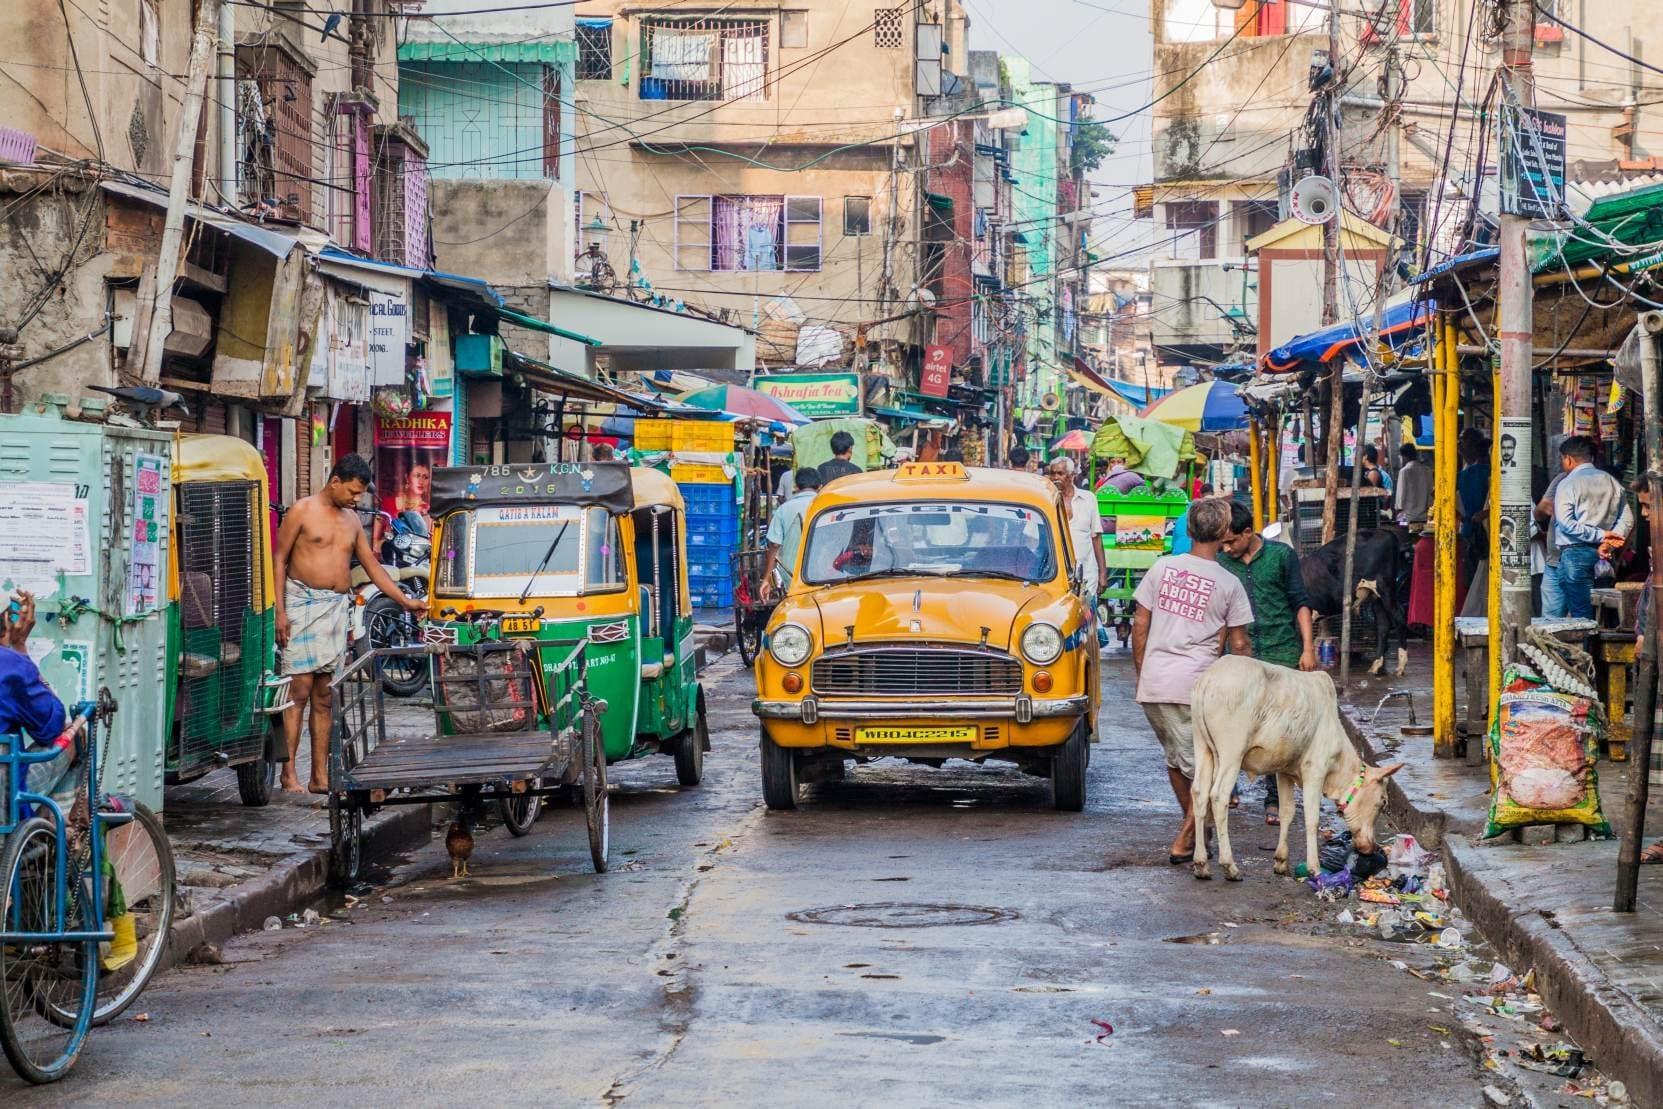 Ulice v Kalkatě, Indie